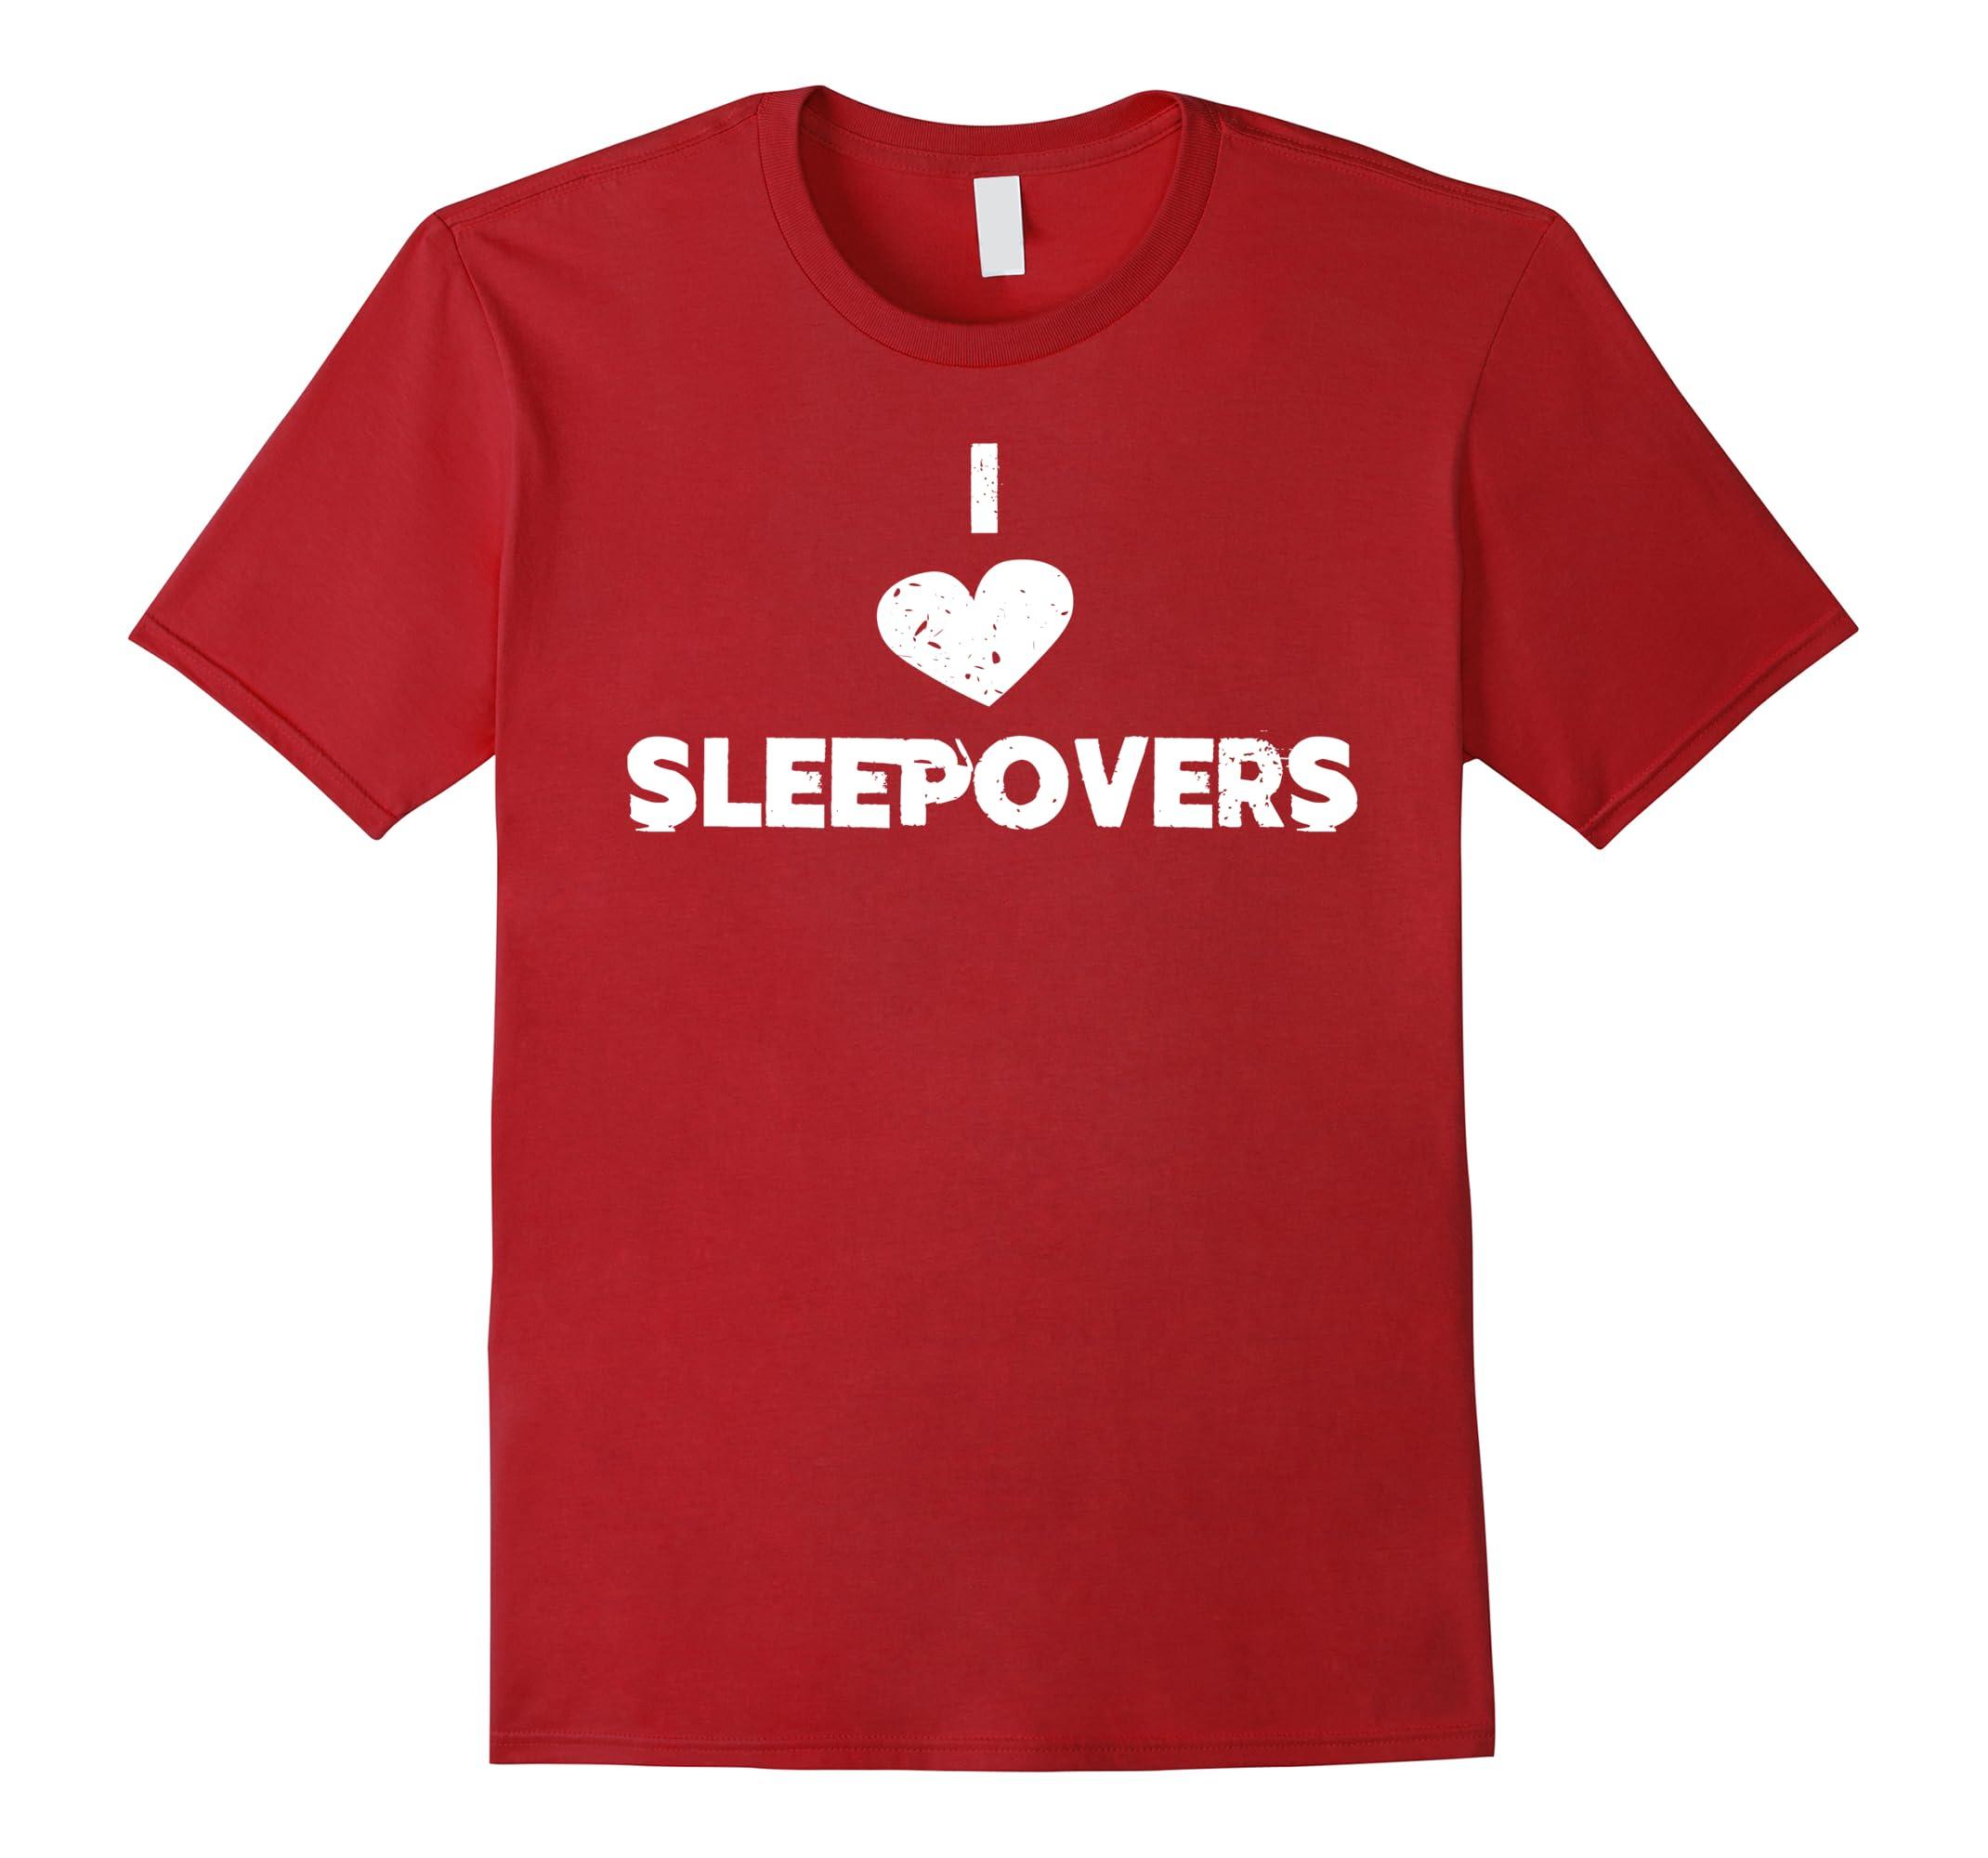 SLEEPOVER BIRTHDAY T-SHIRT SLEEPOVER PARTY-RT